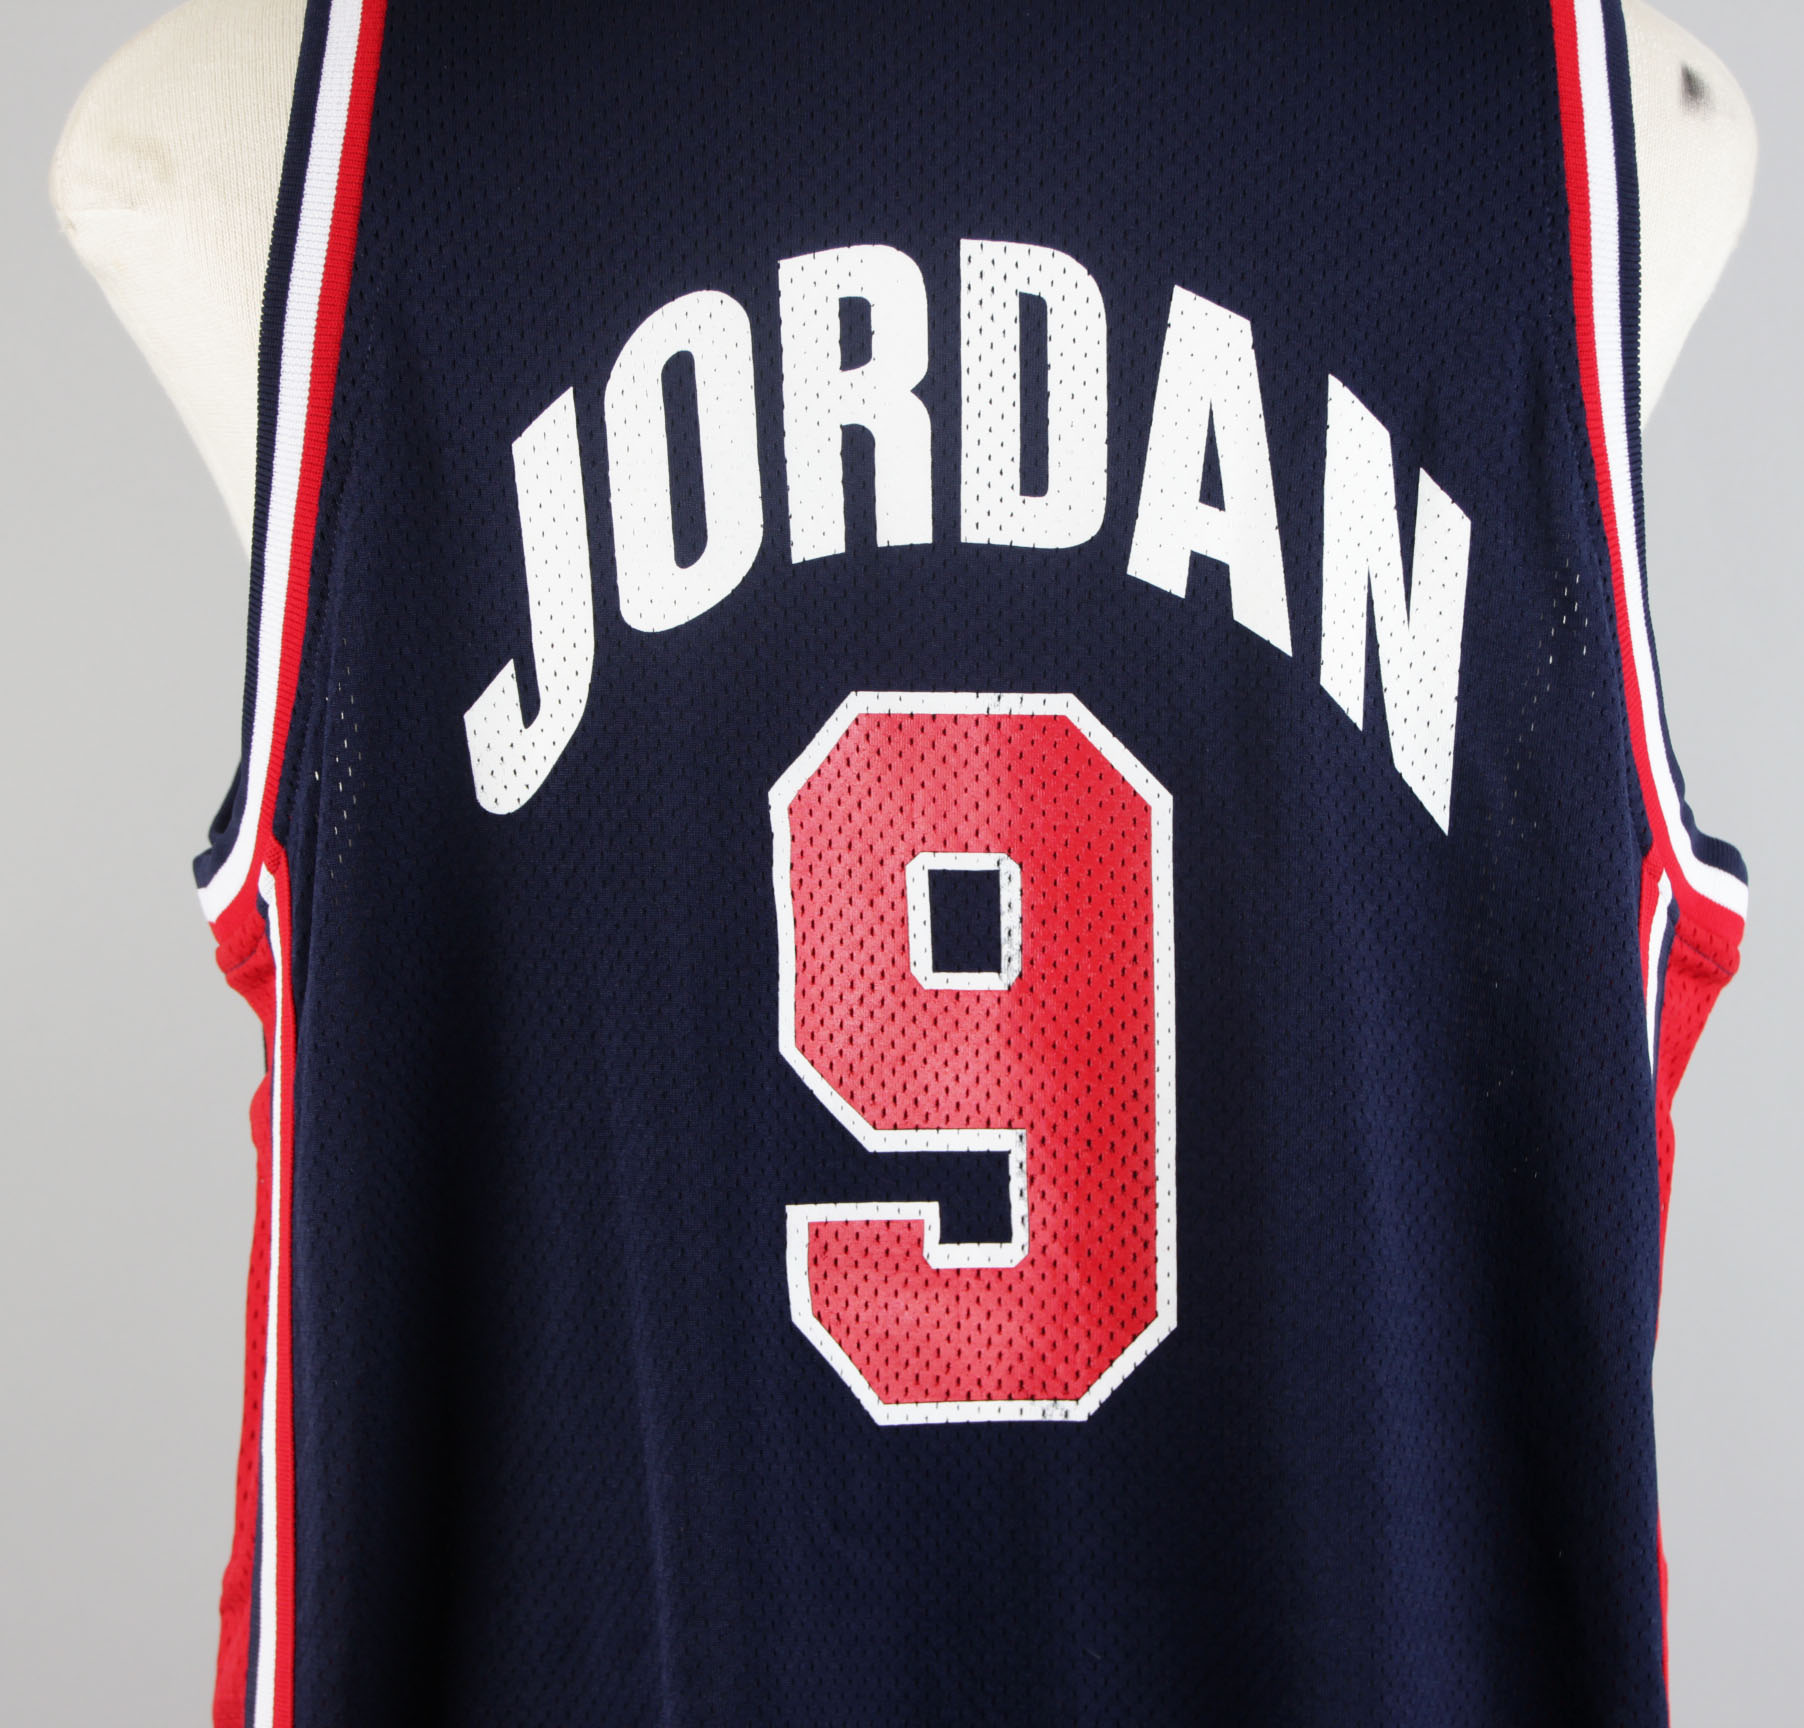 michael jordan olympic jersey